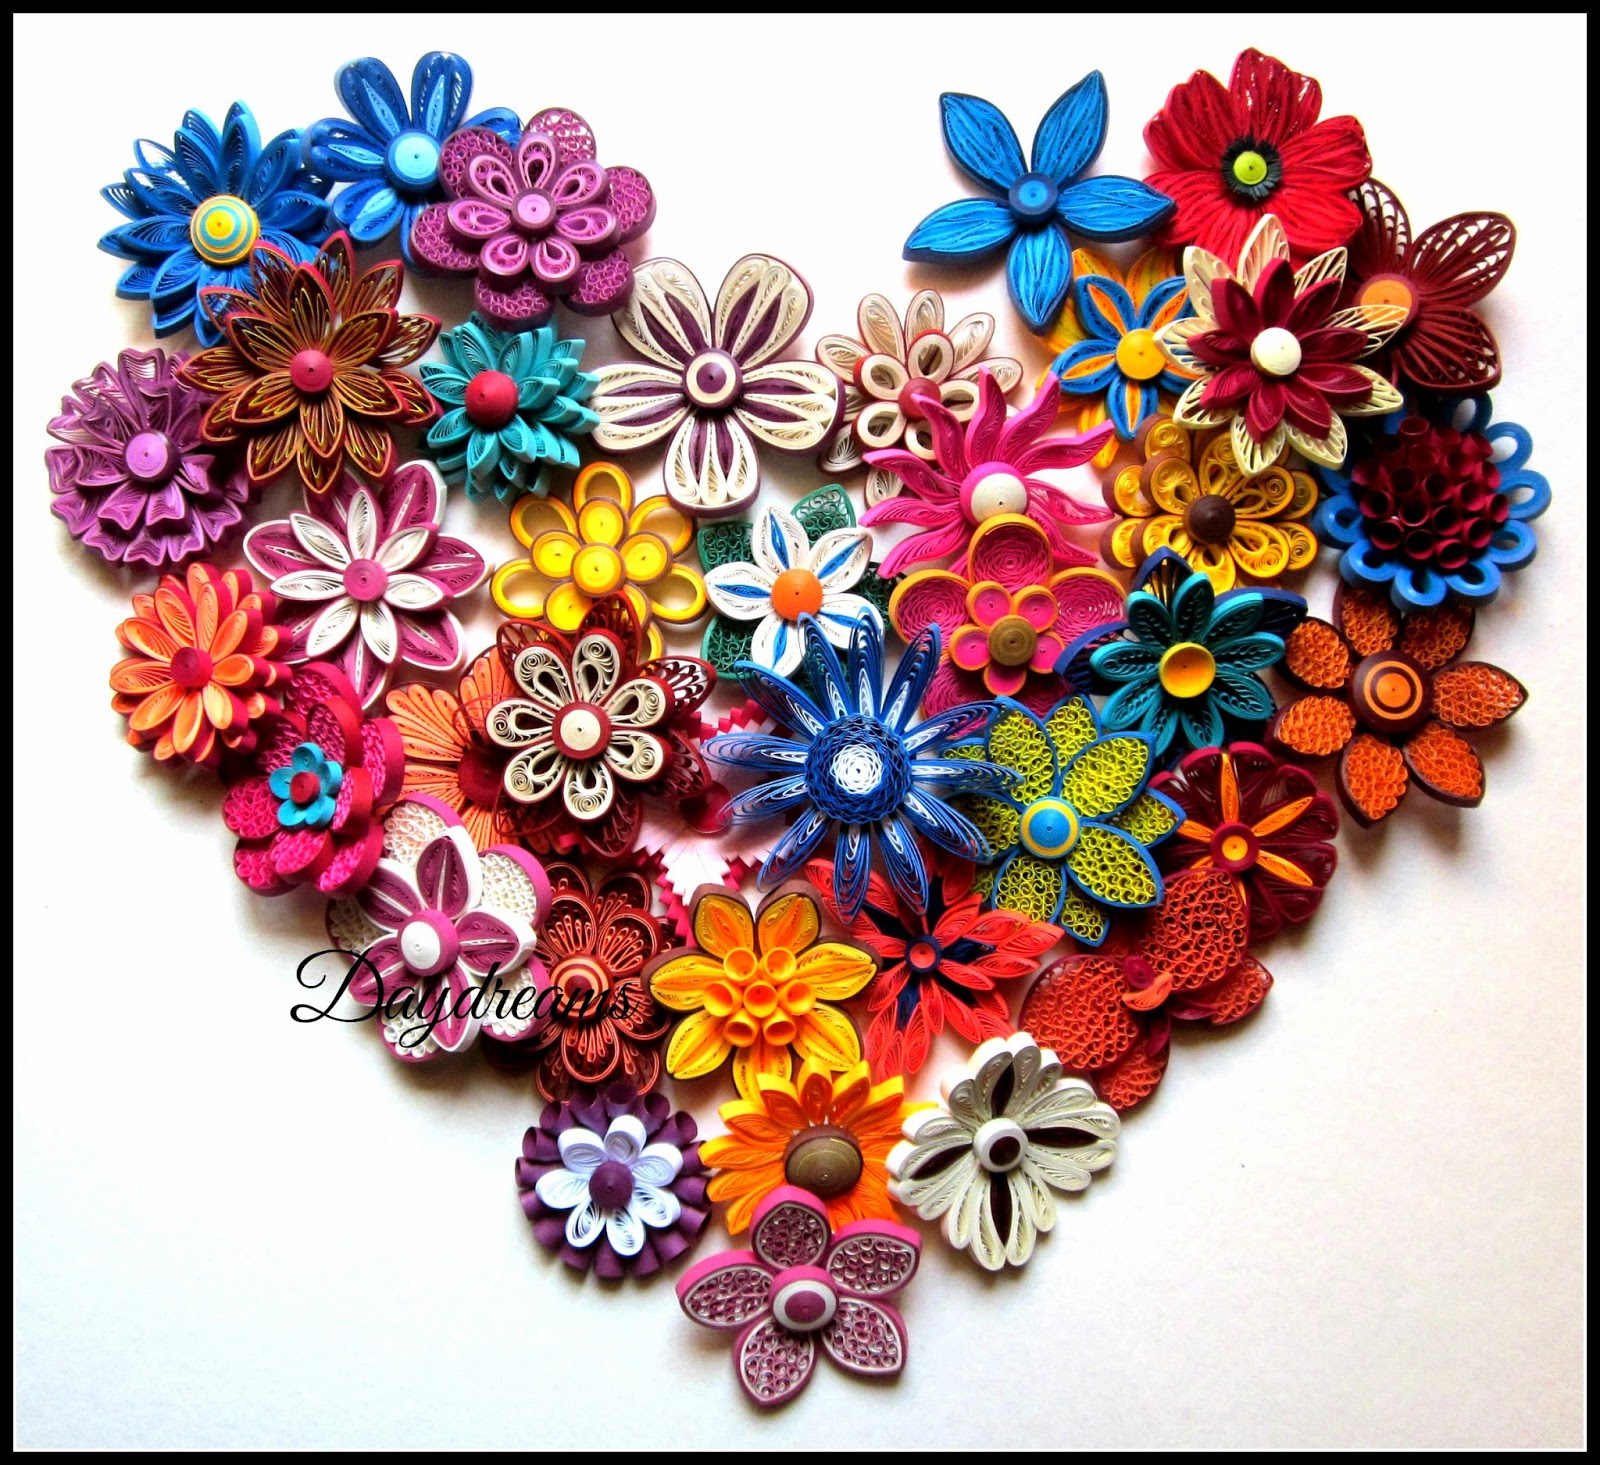 Quilledflowers%2Bheart.JPG